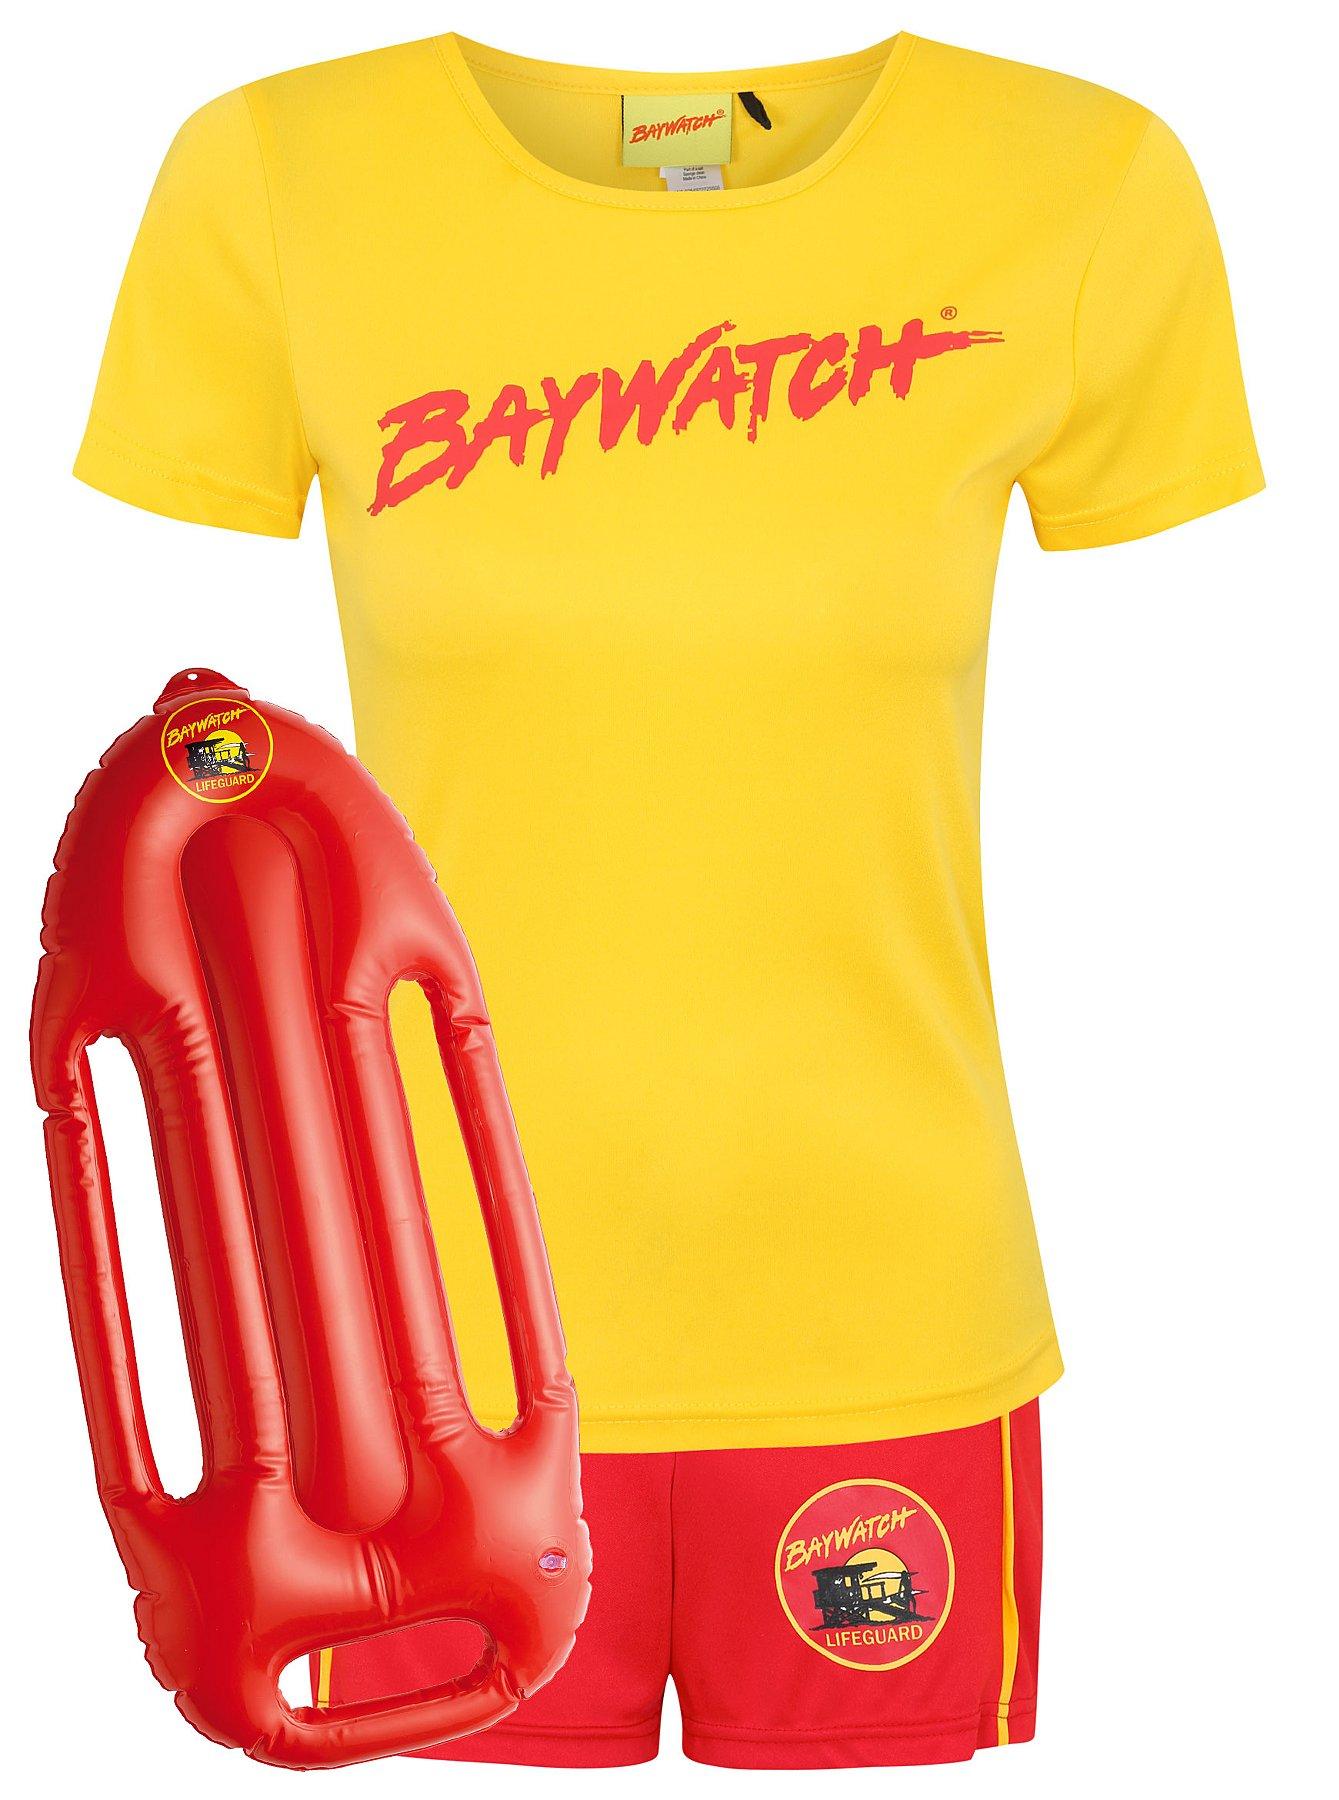 Ladies leather gloves asda - Adult Baywatch Fancy Dress Costume